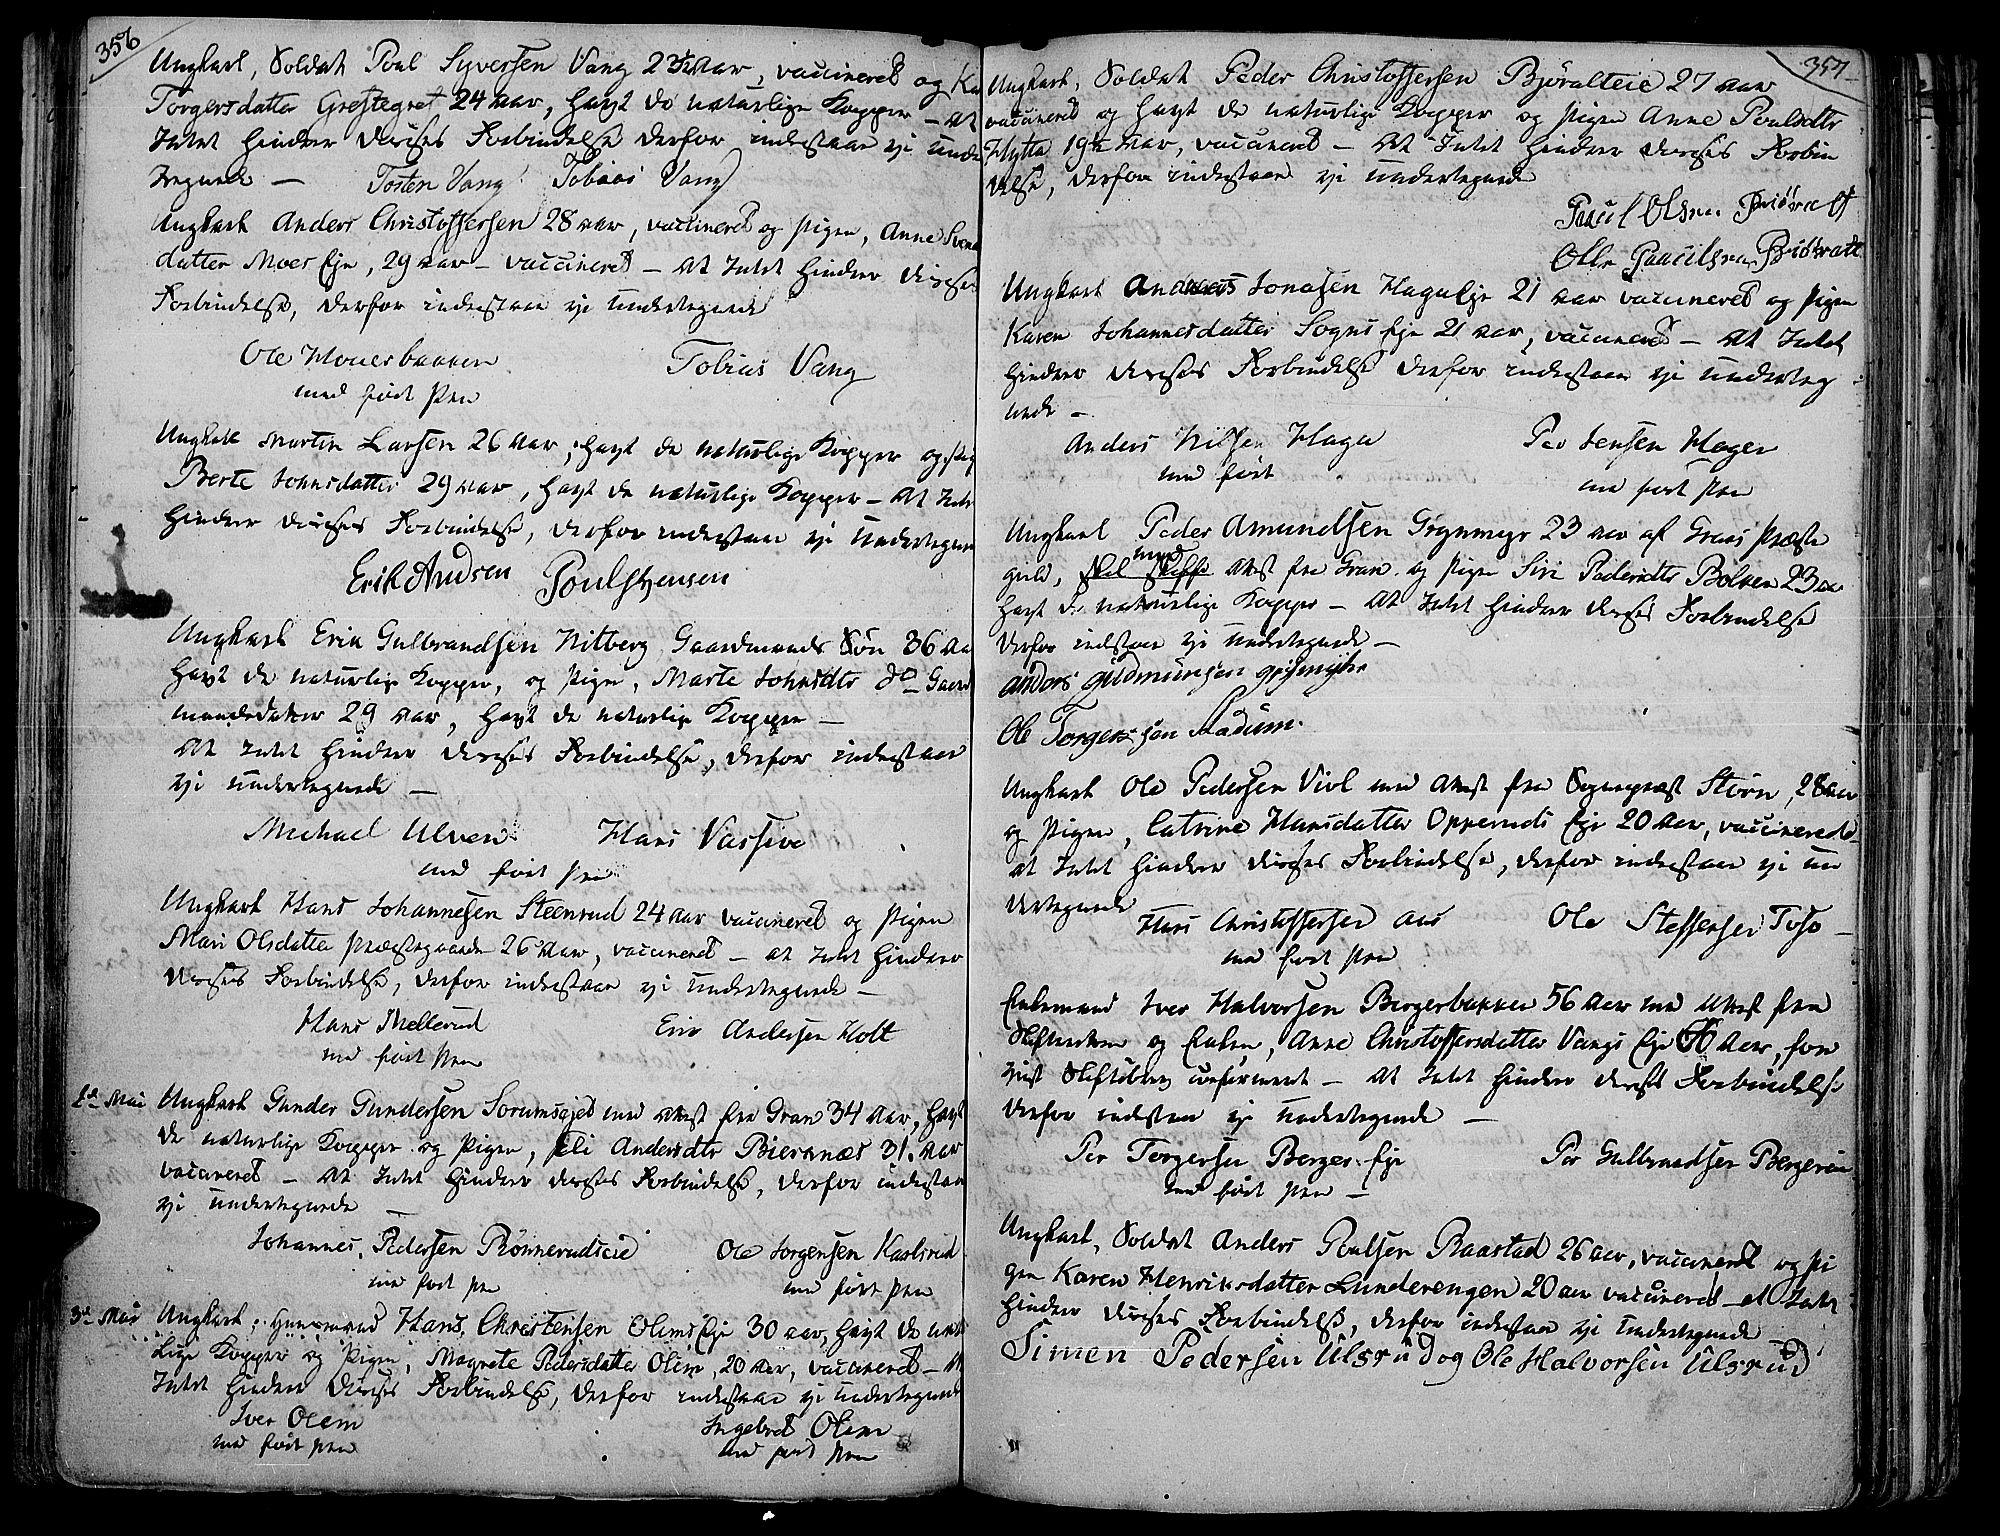 SAH, Jevnaker prestekontor, Ministerialbok nr. 4, 1800-1861, s. 356-357